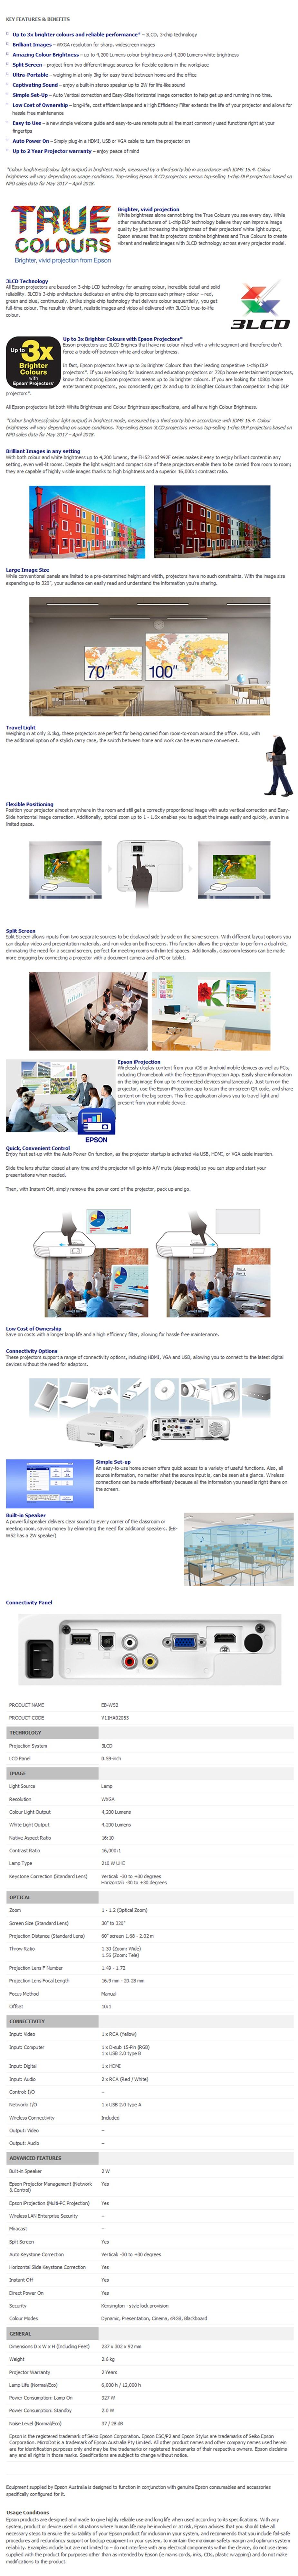 Epson EB-W52 WXGA 3LCD Corporate Portable Multimedia Projector - Overview 1